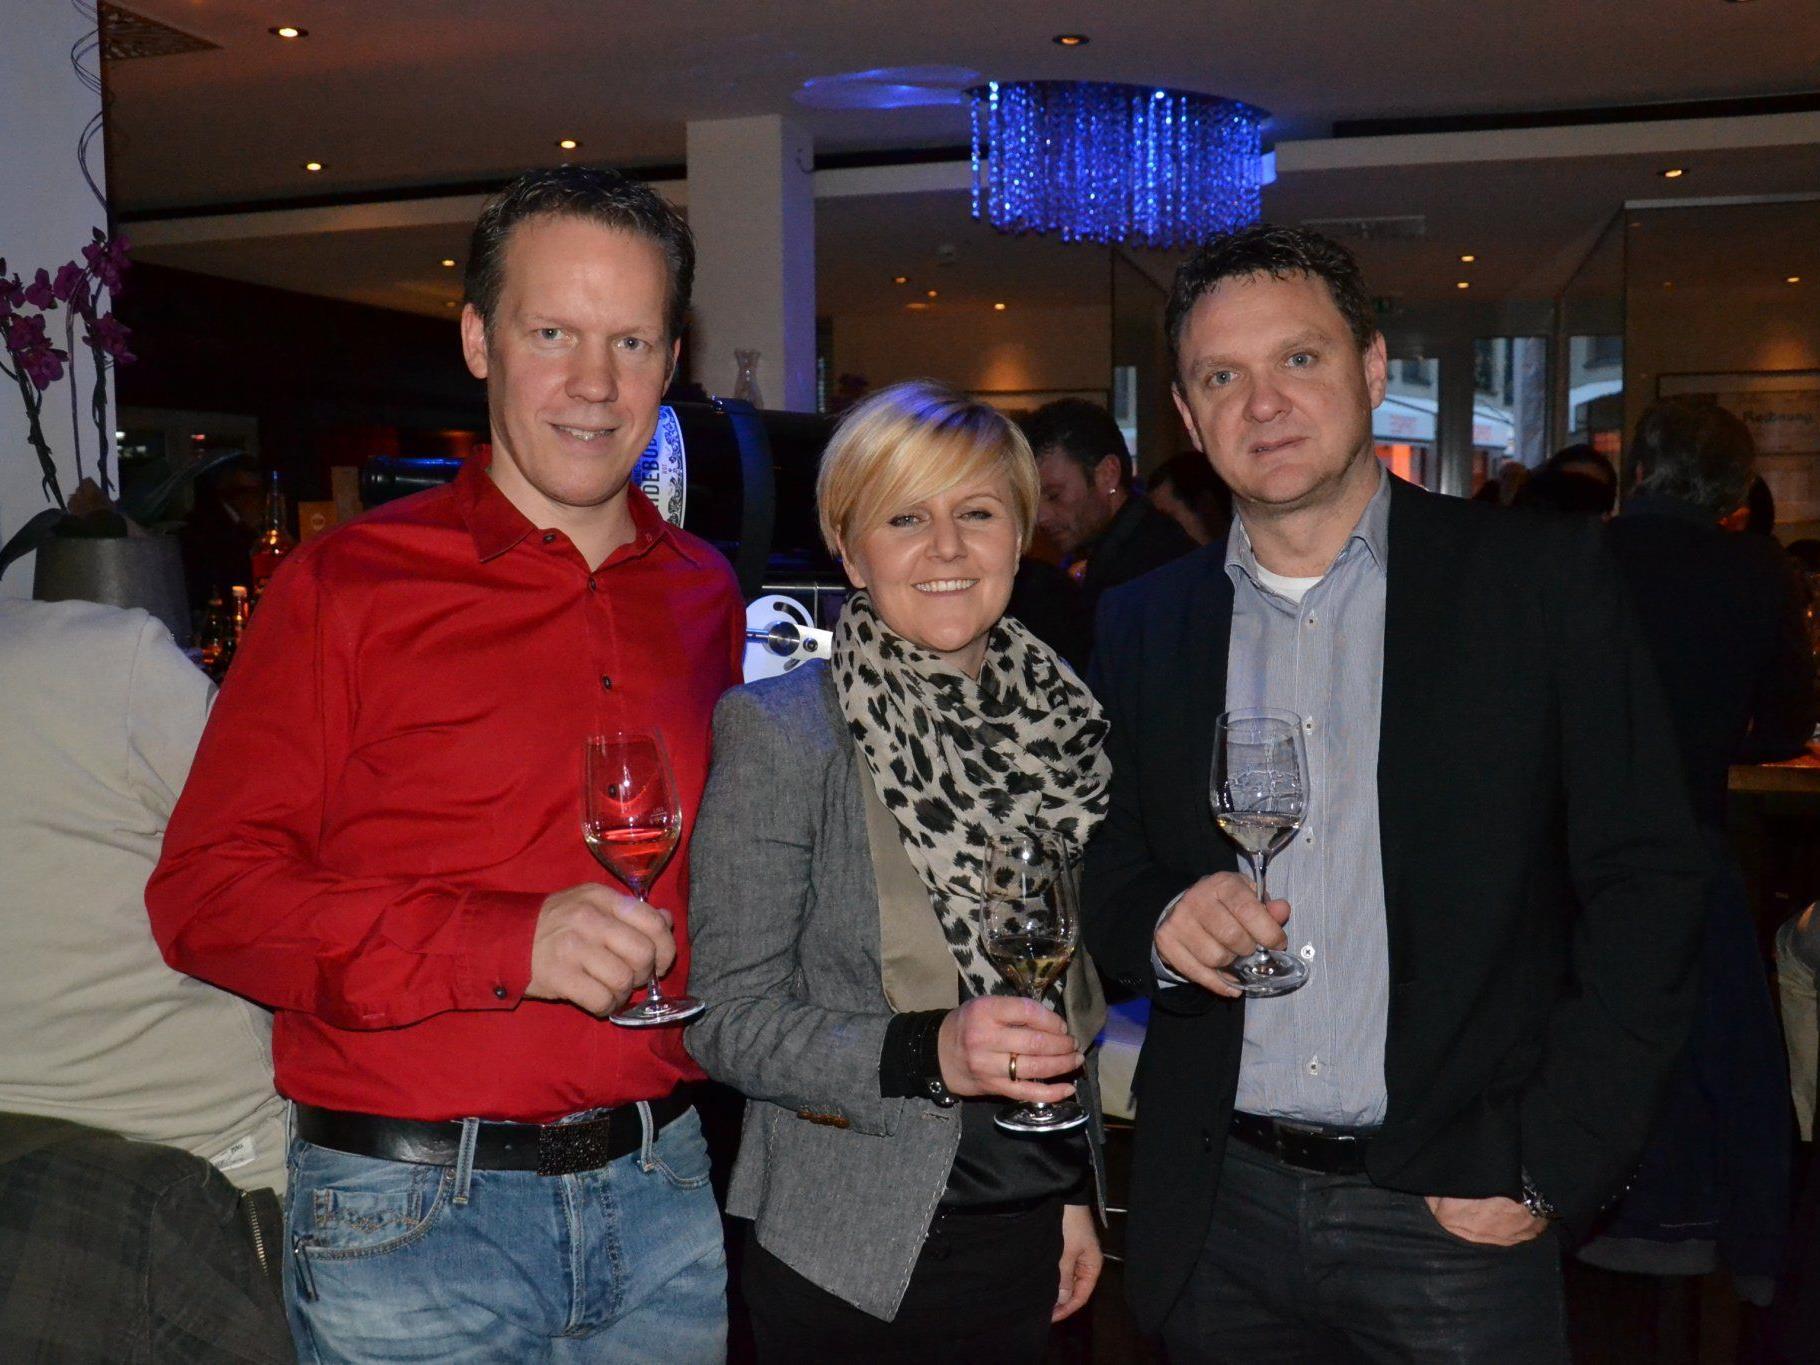 (v.l.) Gastgeber Mitch Baumann, Fleur & Bernd Schuler bei der Weinverkostung im hubers